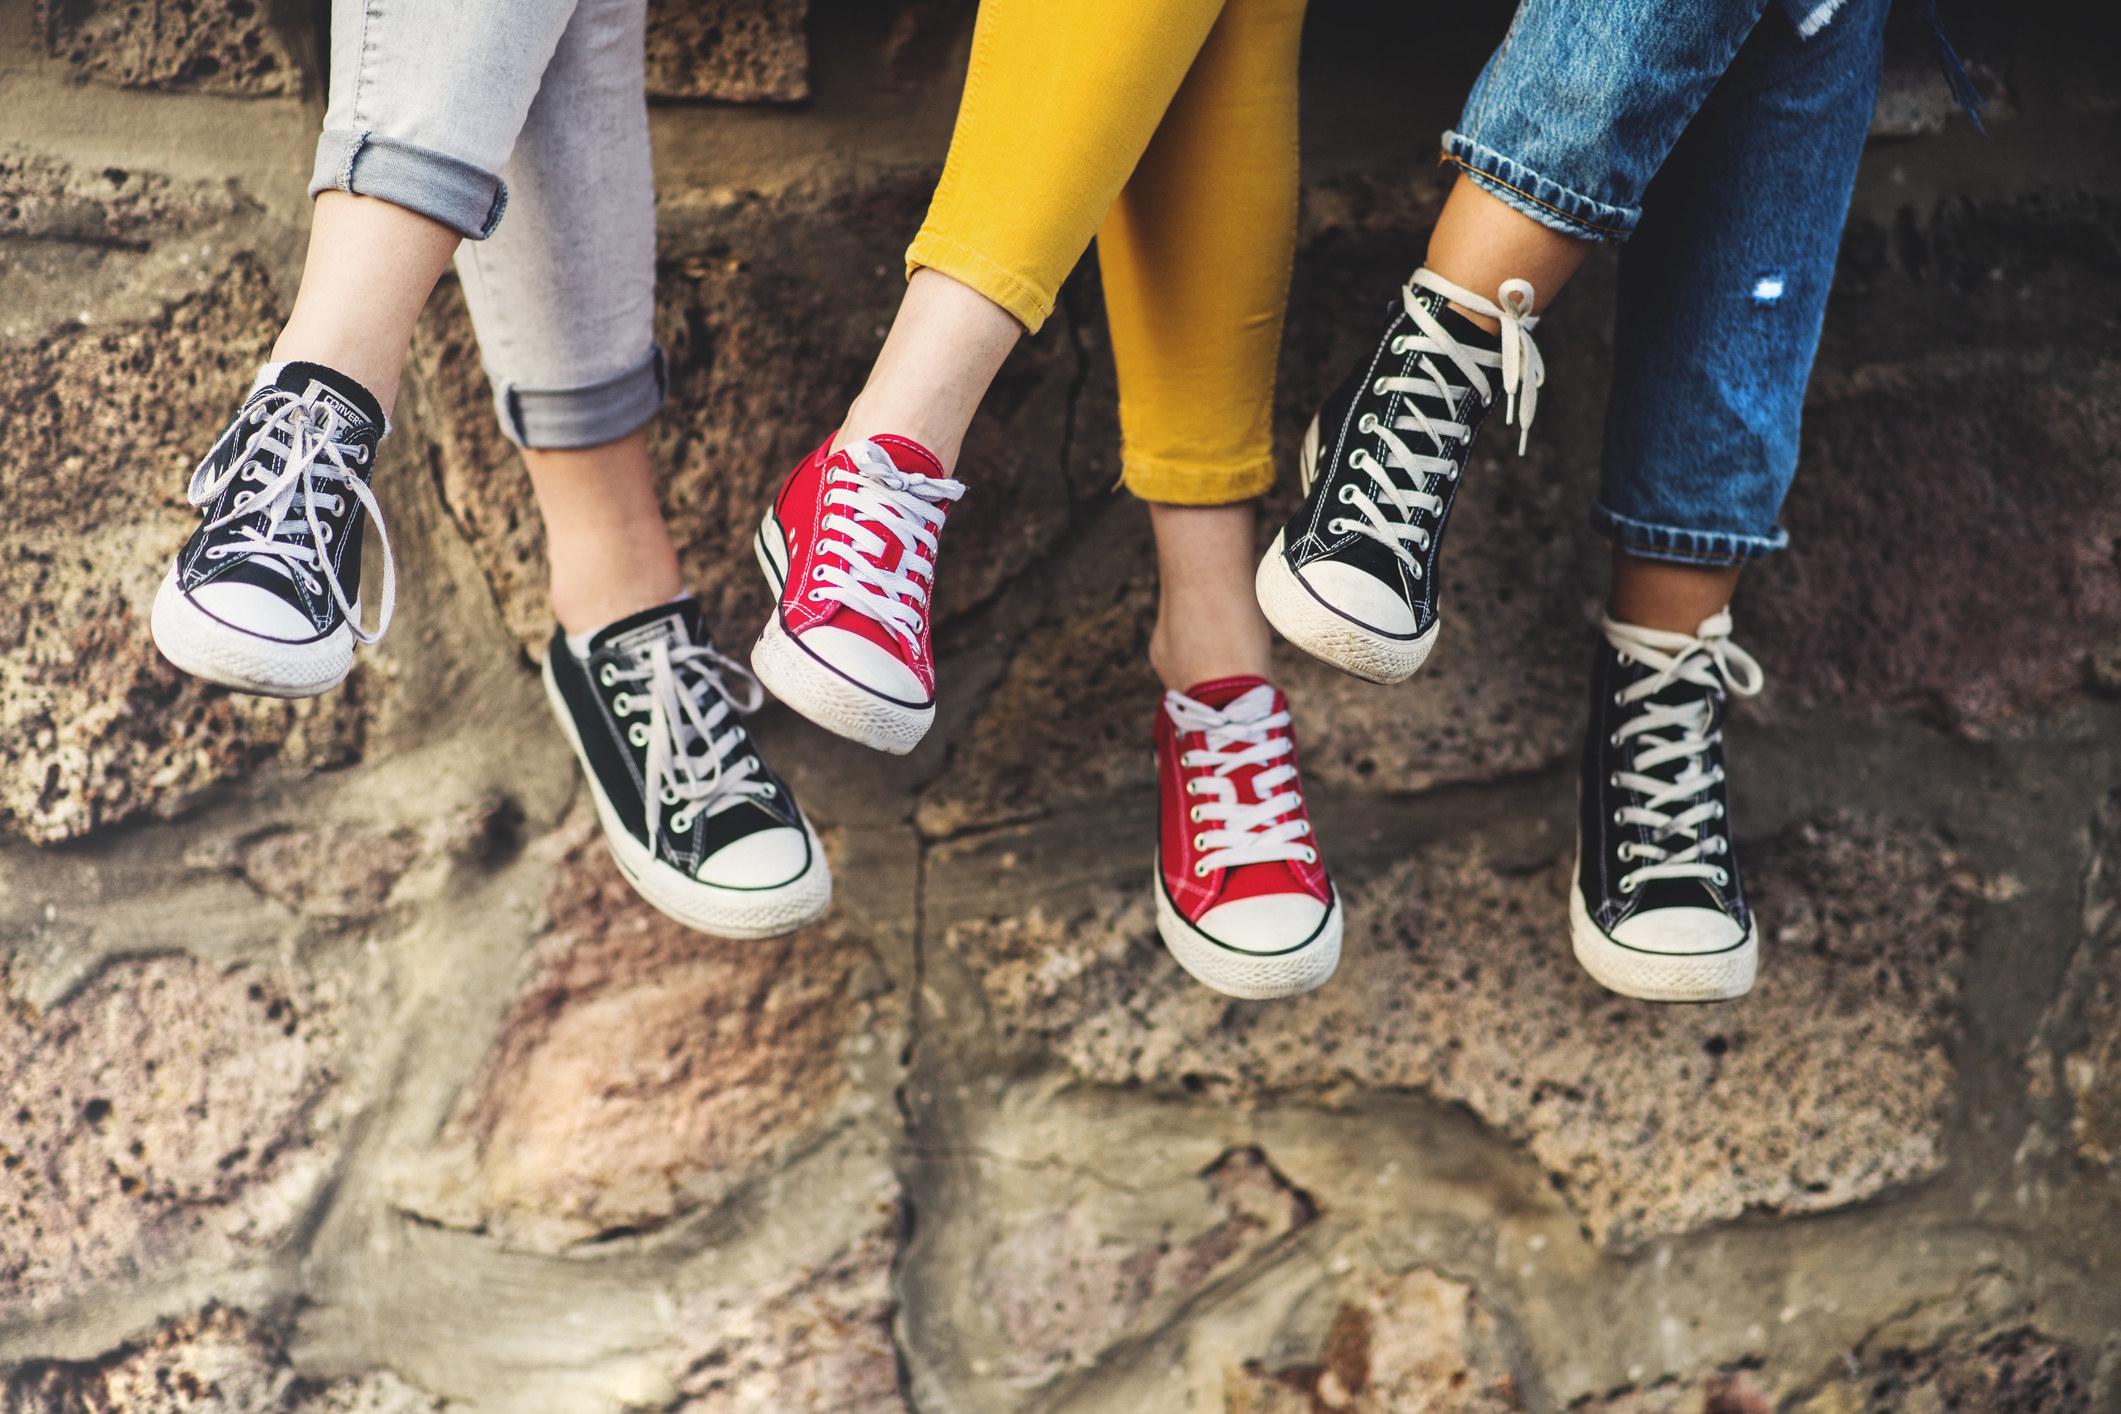 Legs of three female teenager friends sitting cross-legged on a wall, wearing sneakers